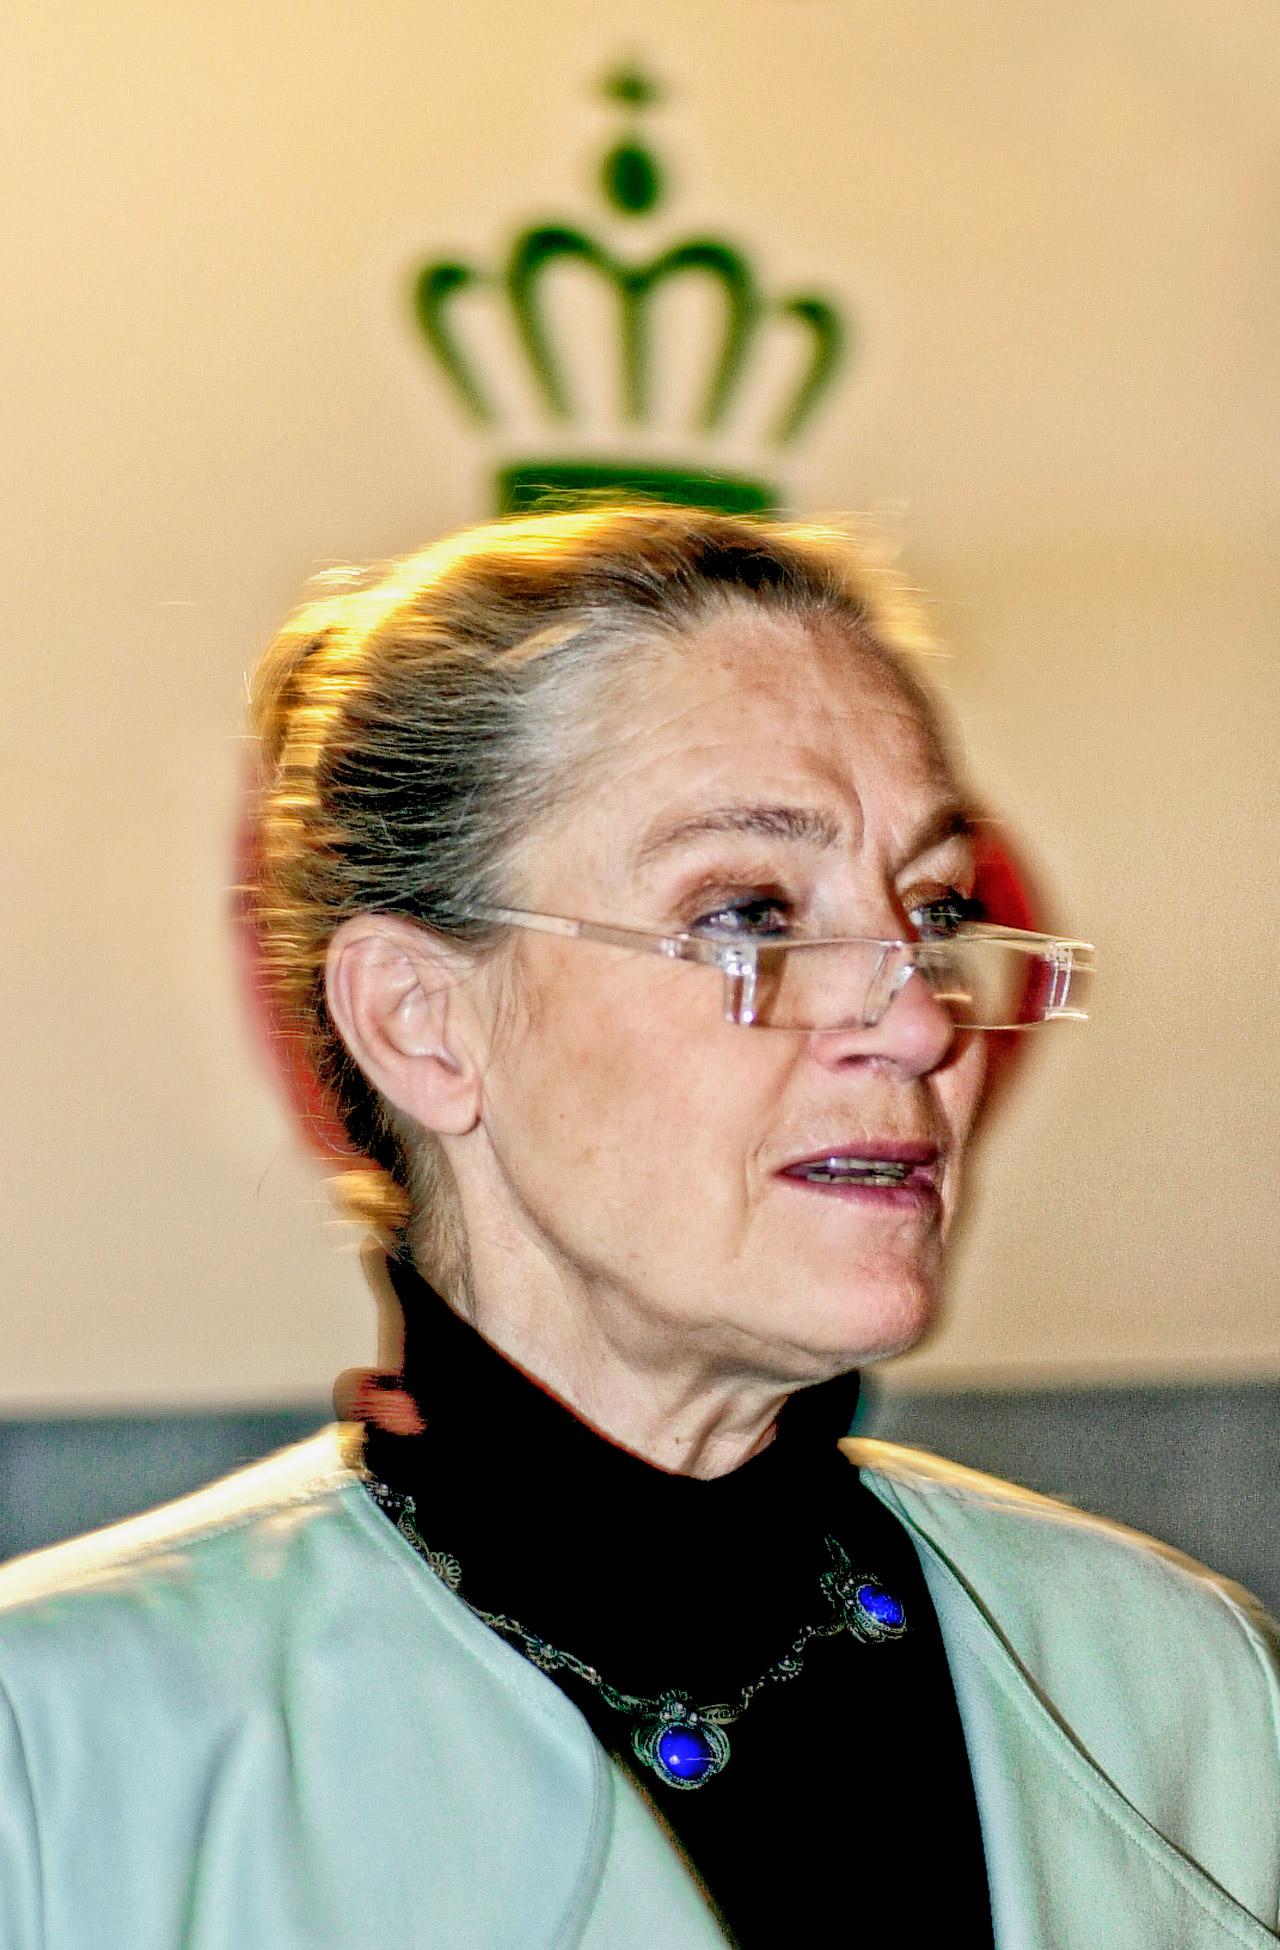 Ritt Bjerregaard, dronning, socialdemokratiet, krone, bydronning, kræft, død